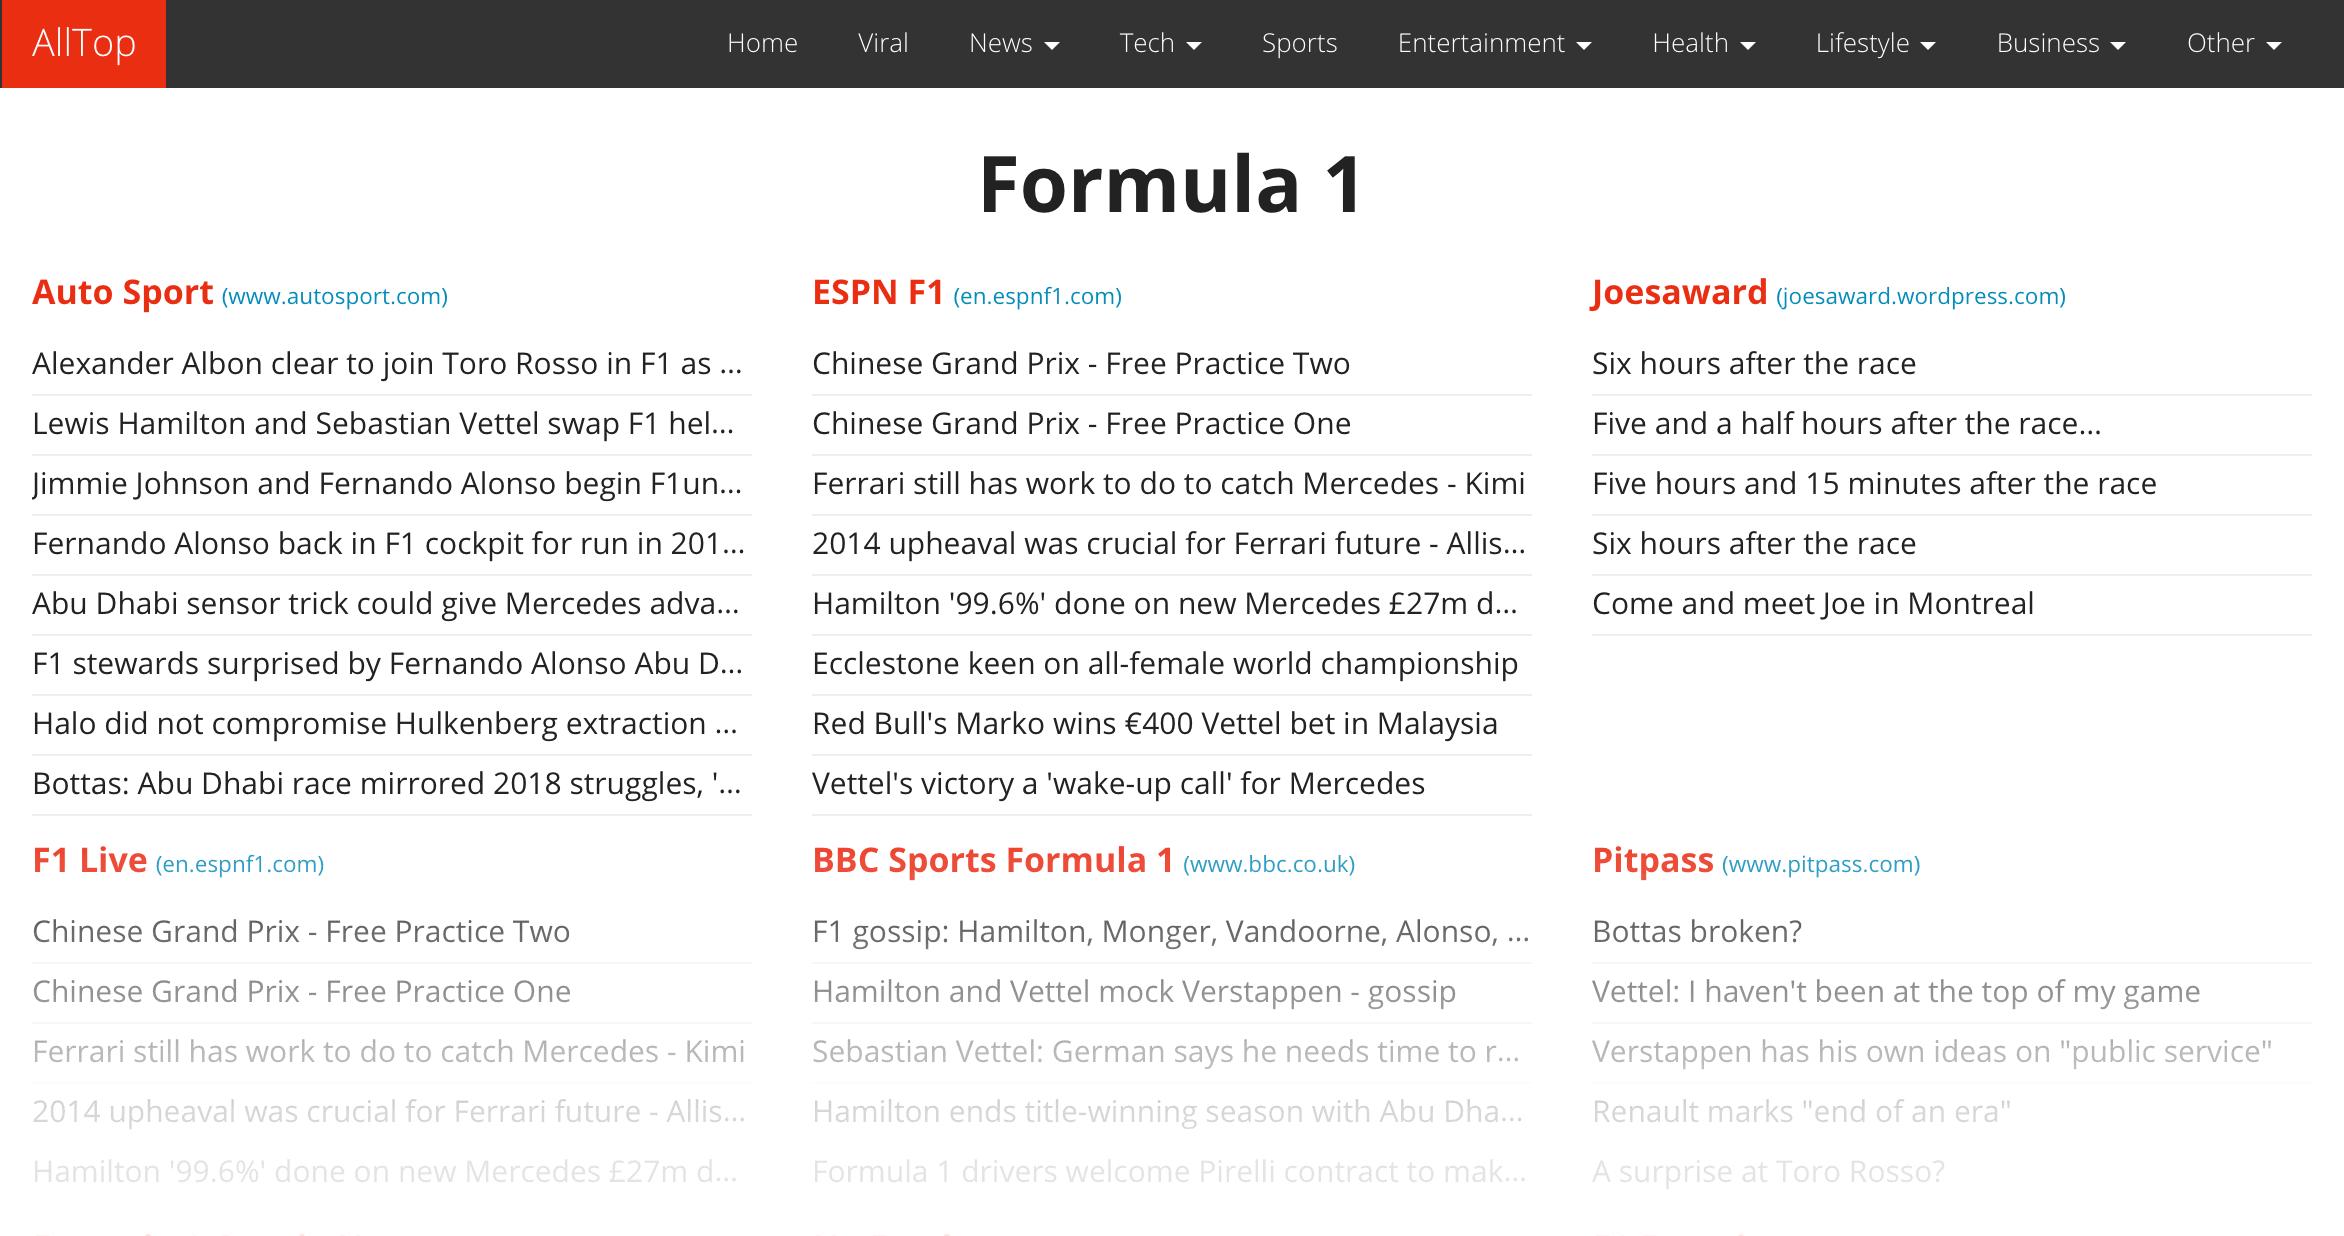 Alltop – Formula 1 list